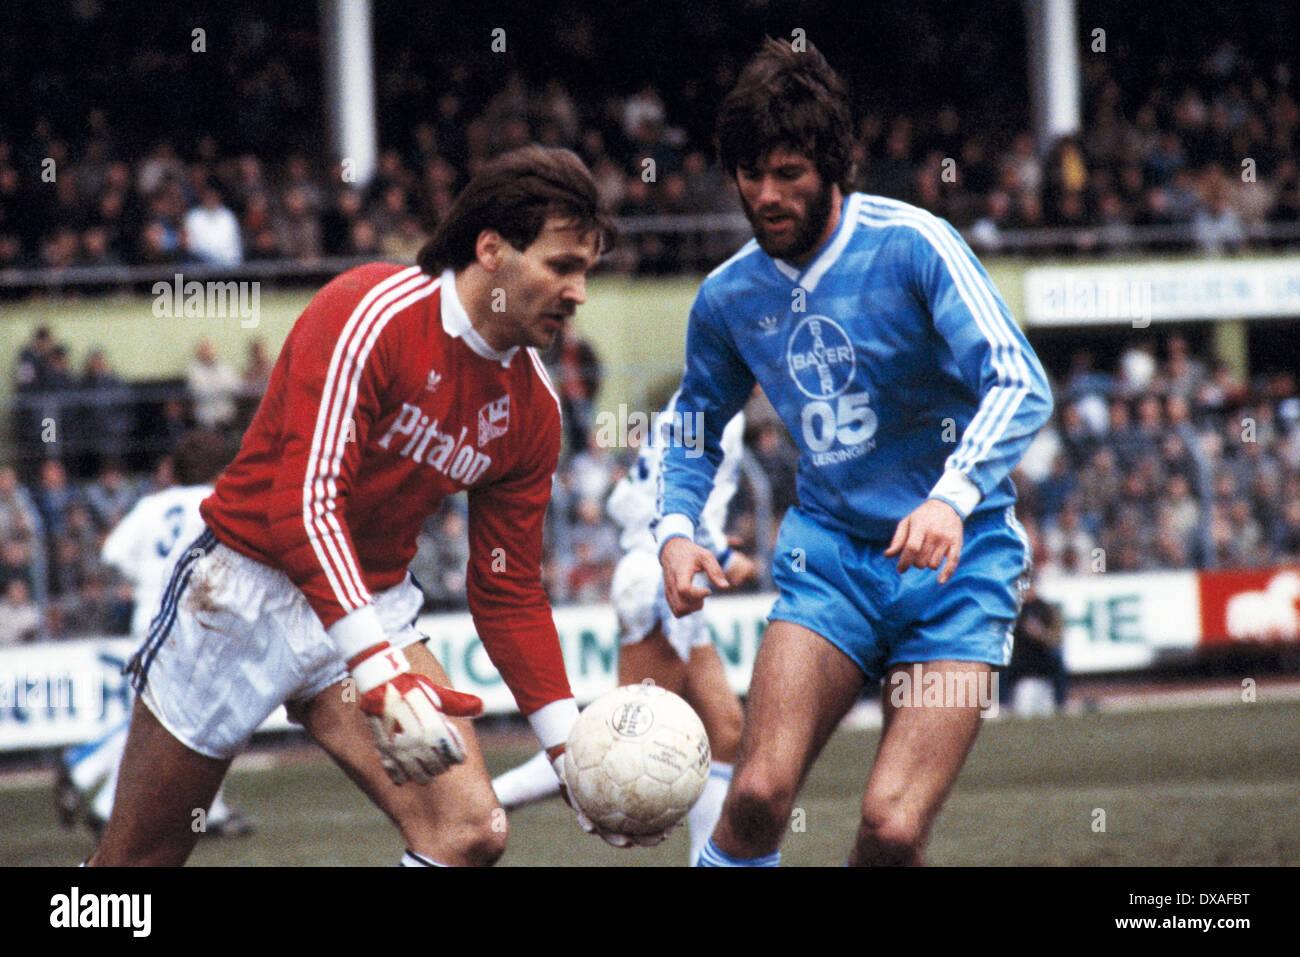 football, Bundesliga, 1984/1985, Grotenburg Stadium, FC Bayer 05 Uerdingen versus SV Waldhof Mannheim 2:2, scene of the match, goal kick by keeper Uwe Zimmermann (SVW), right Friedhelm Funkel (Bayer) - Stock Image